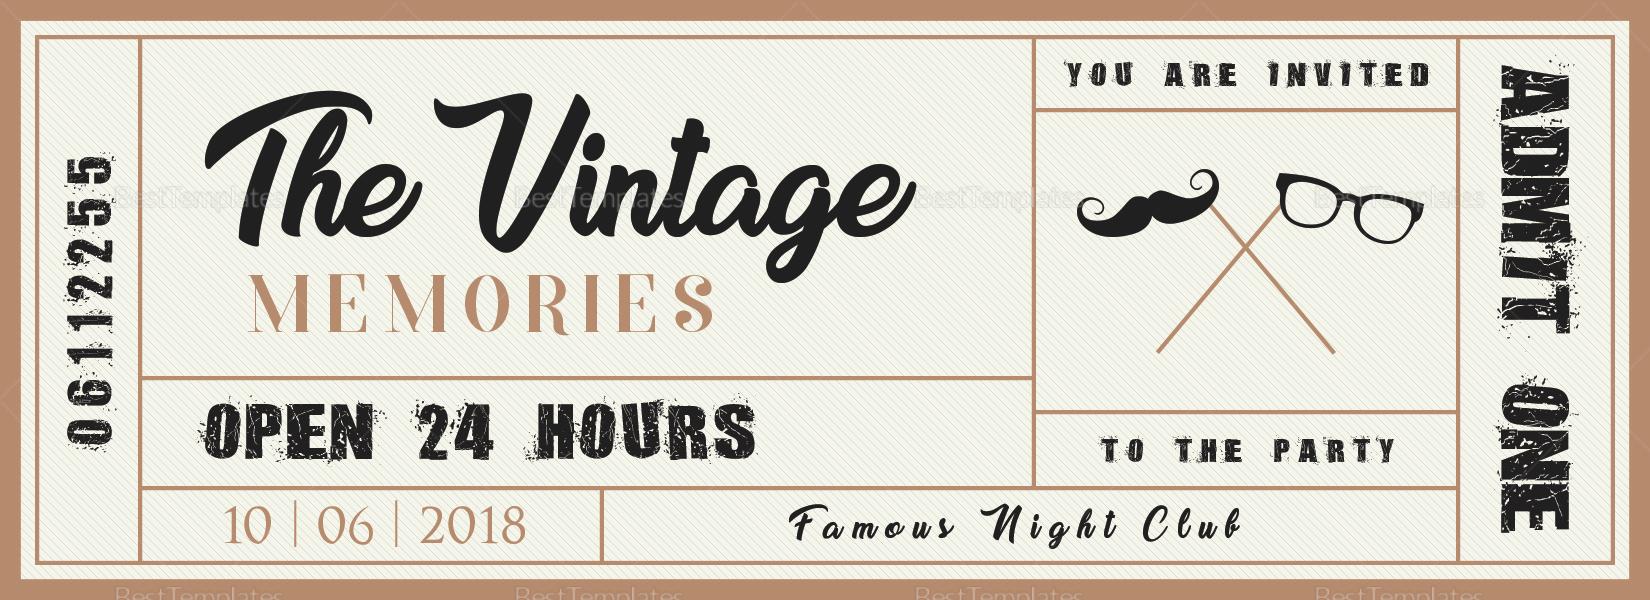 Vintage Event Ticket Design Template